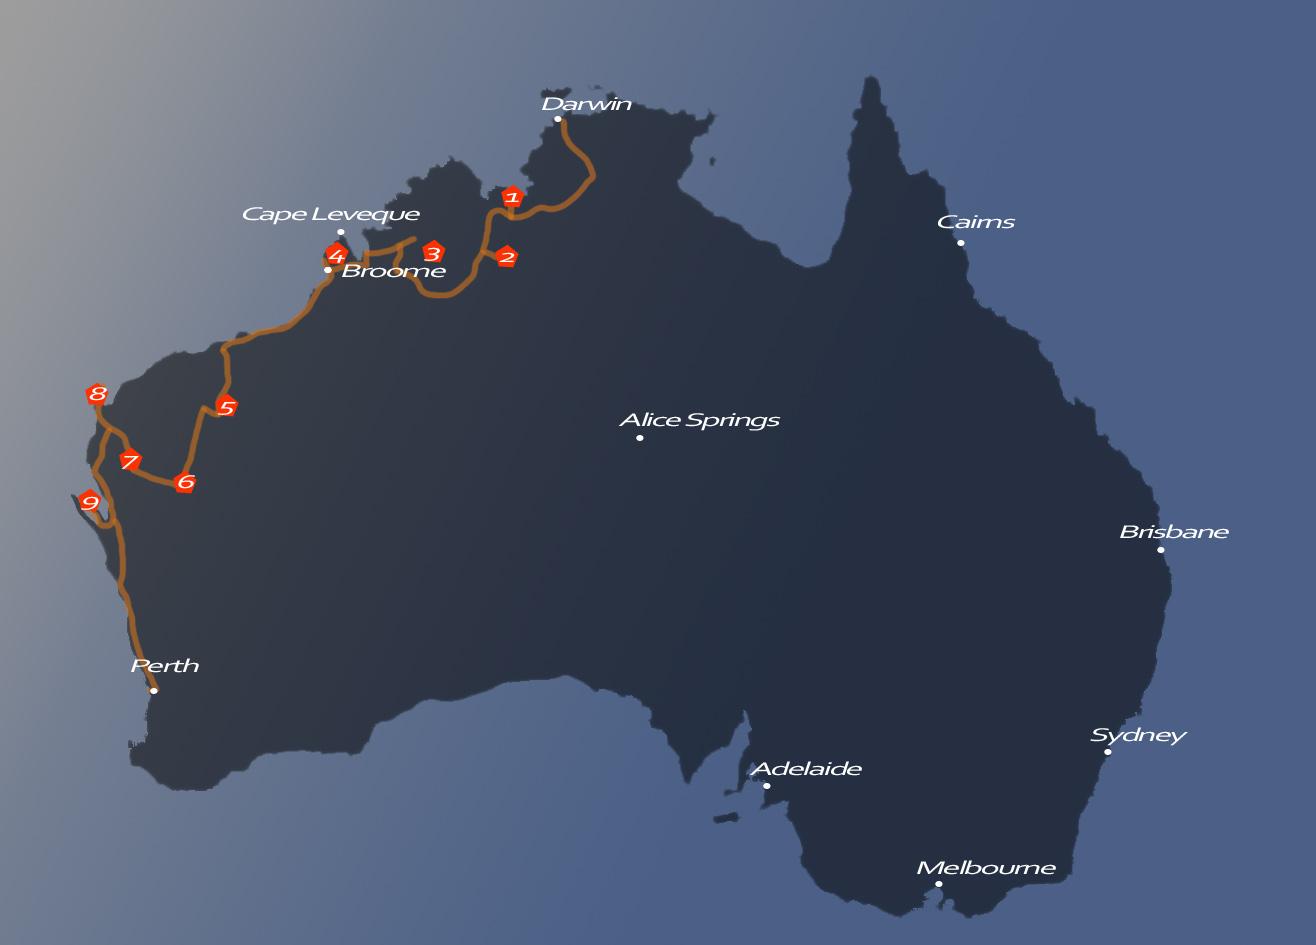 Australienmap_Darwin_Perth